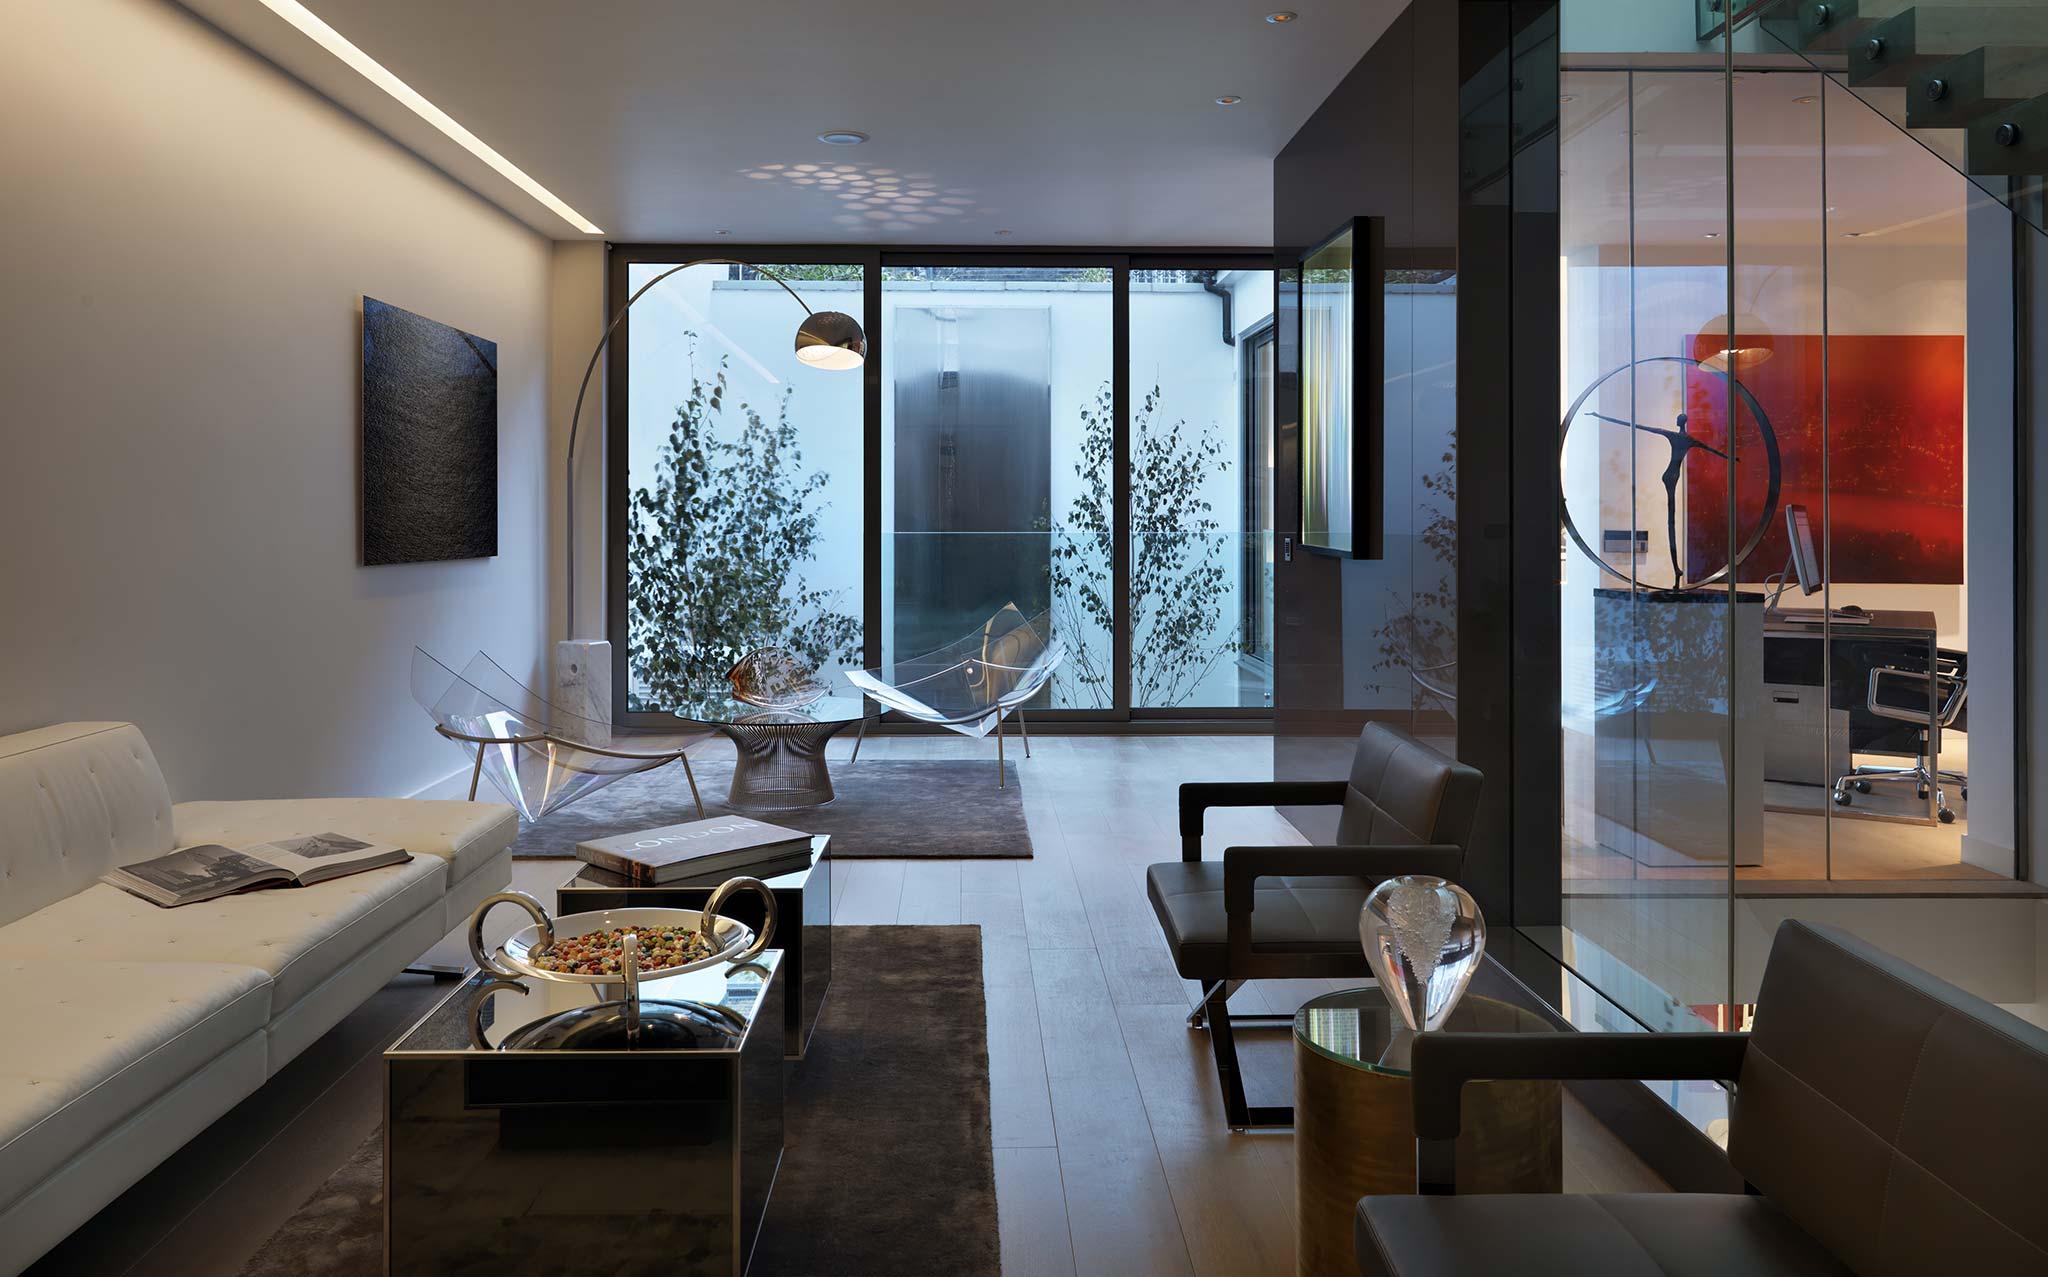 Callender Howorth Interior Designs and Architecture